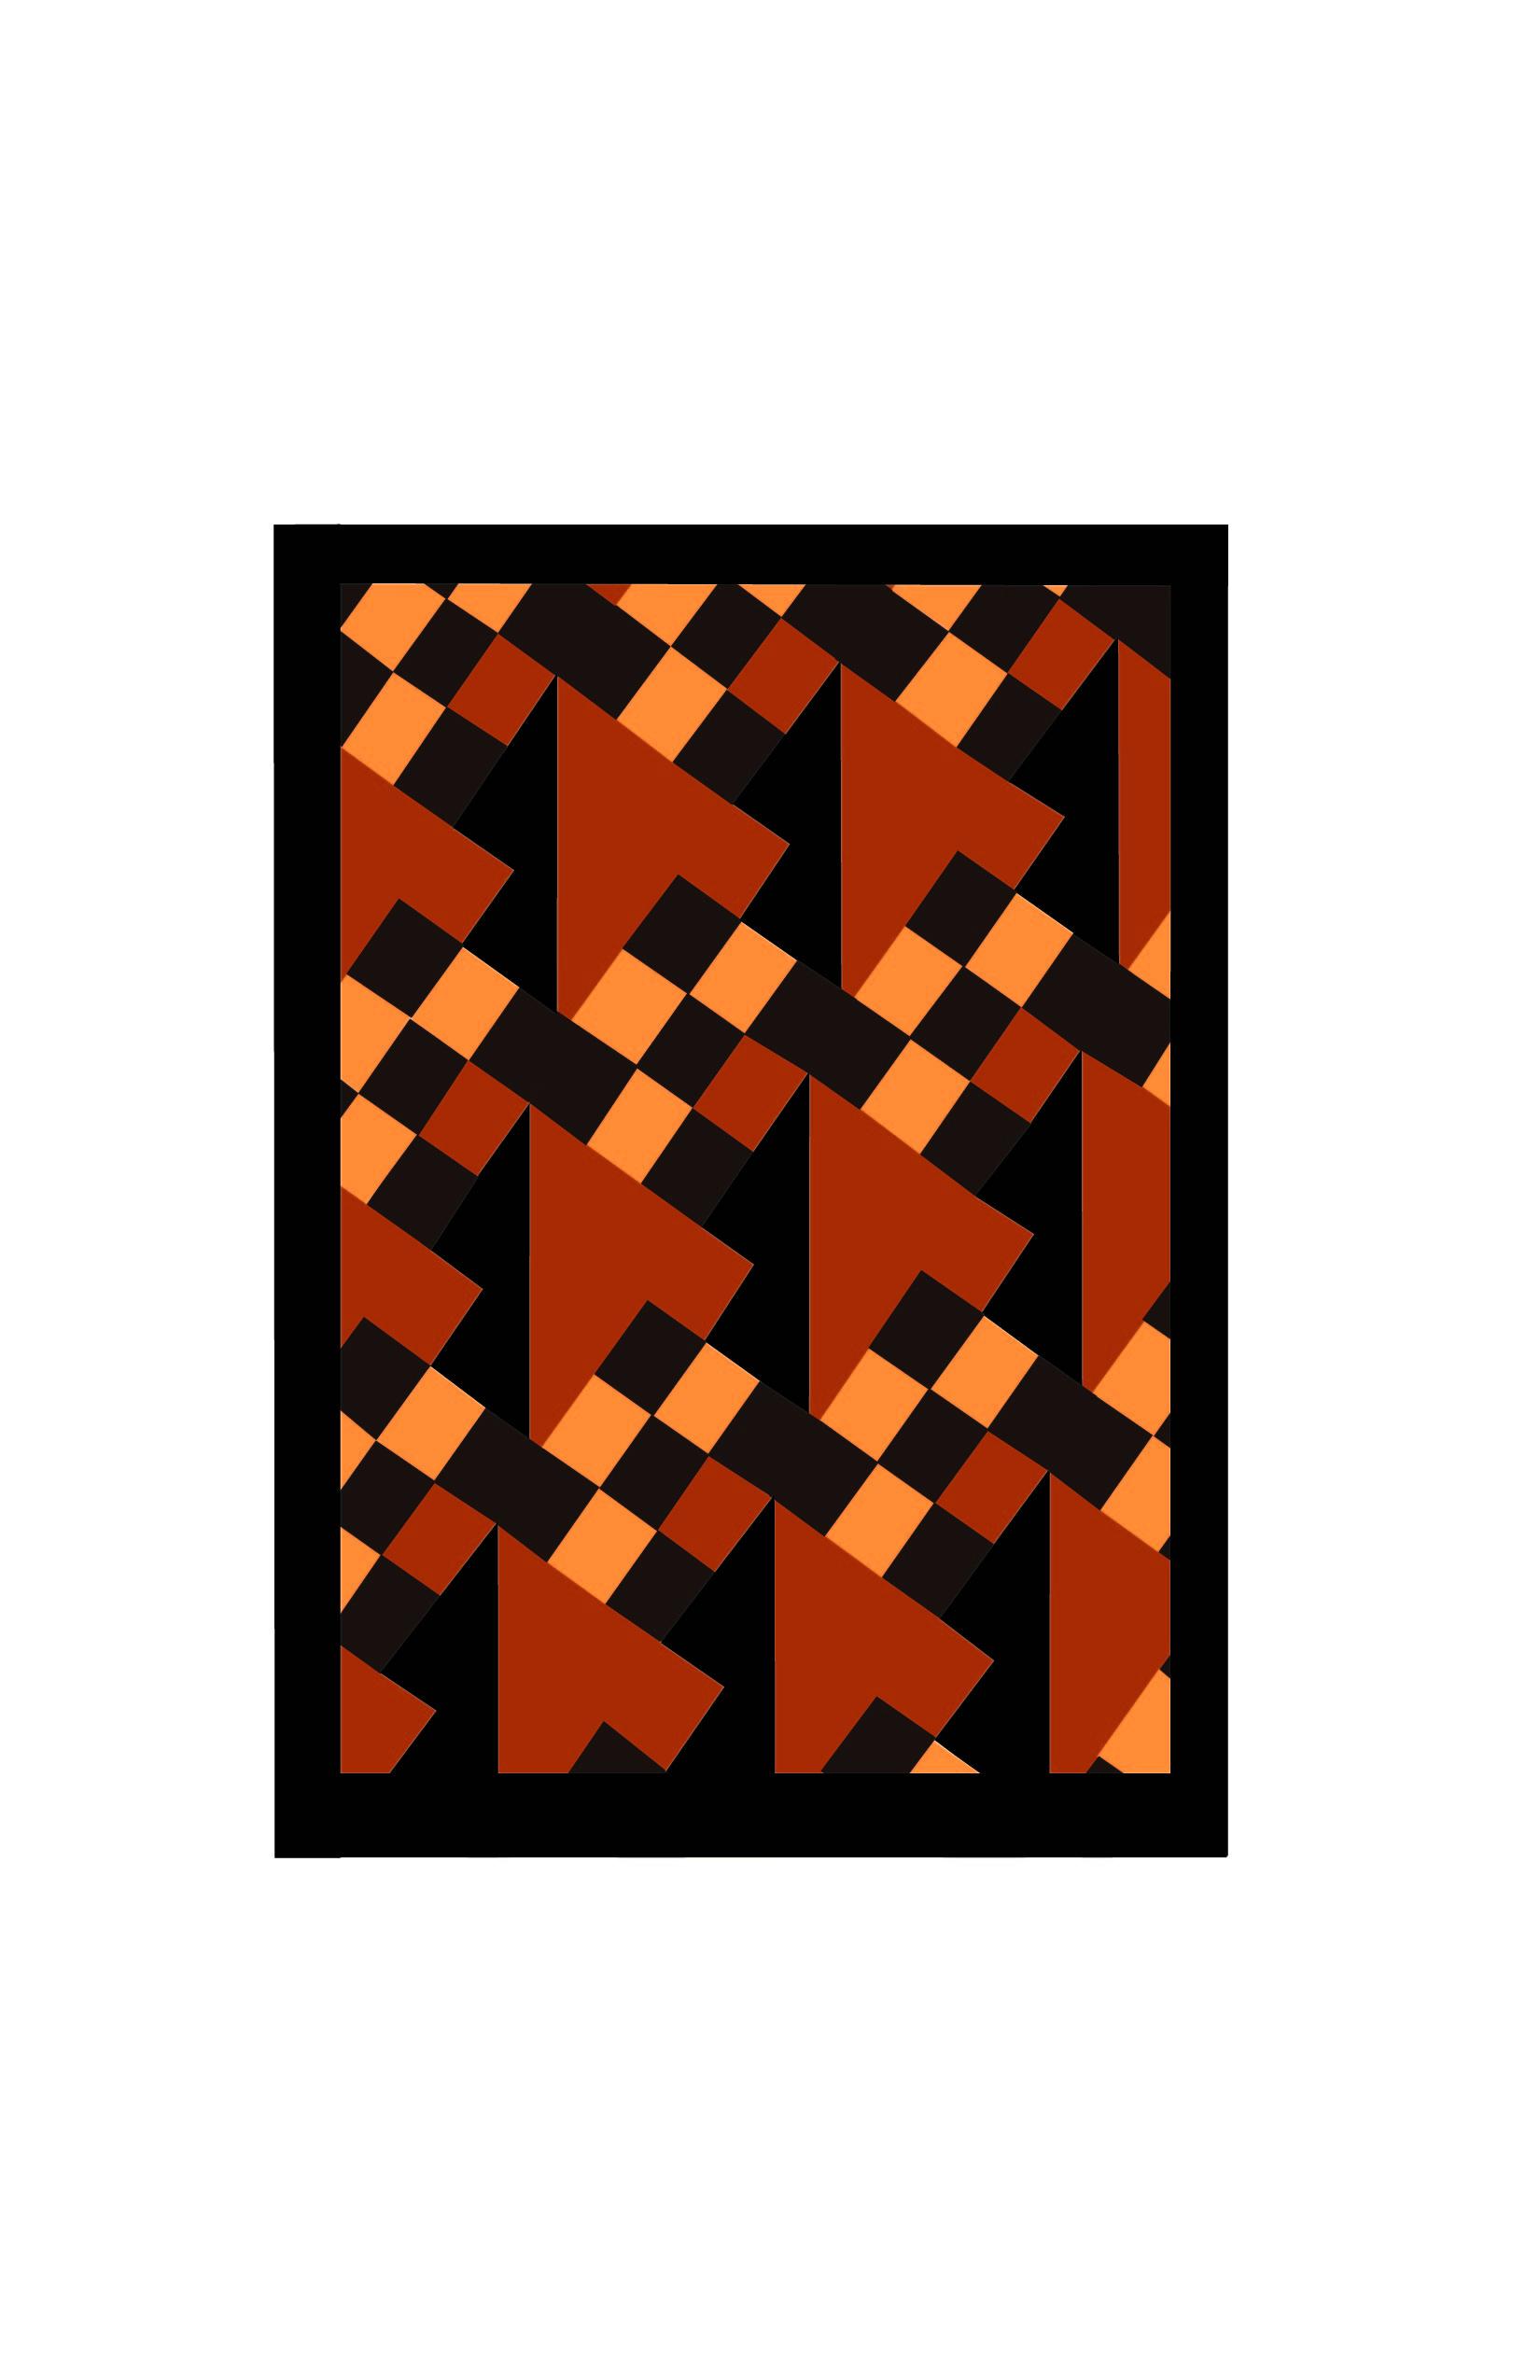 Orange Checkers